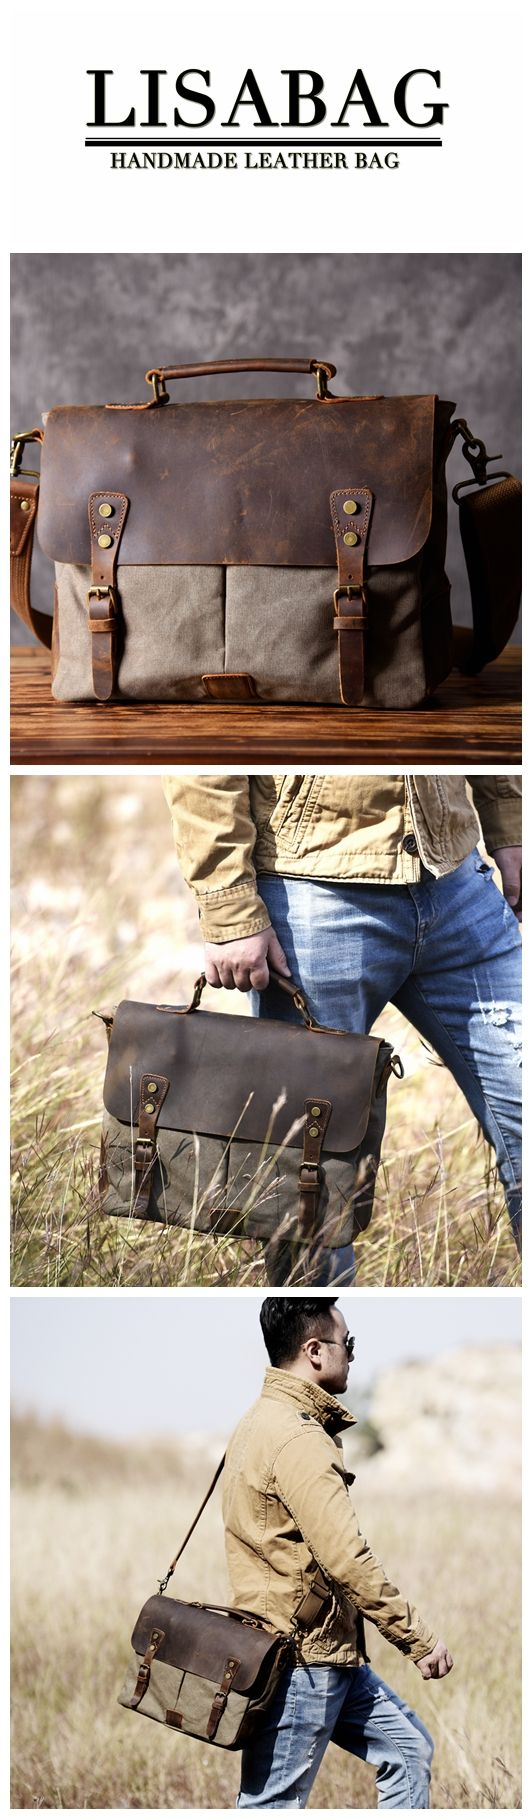 Handmade Canvas Leather Briefcase Messenger Bag Handbag Shoulder Bag Laptop  Bag 1807 a3eeaa06664c6